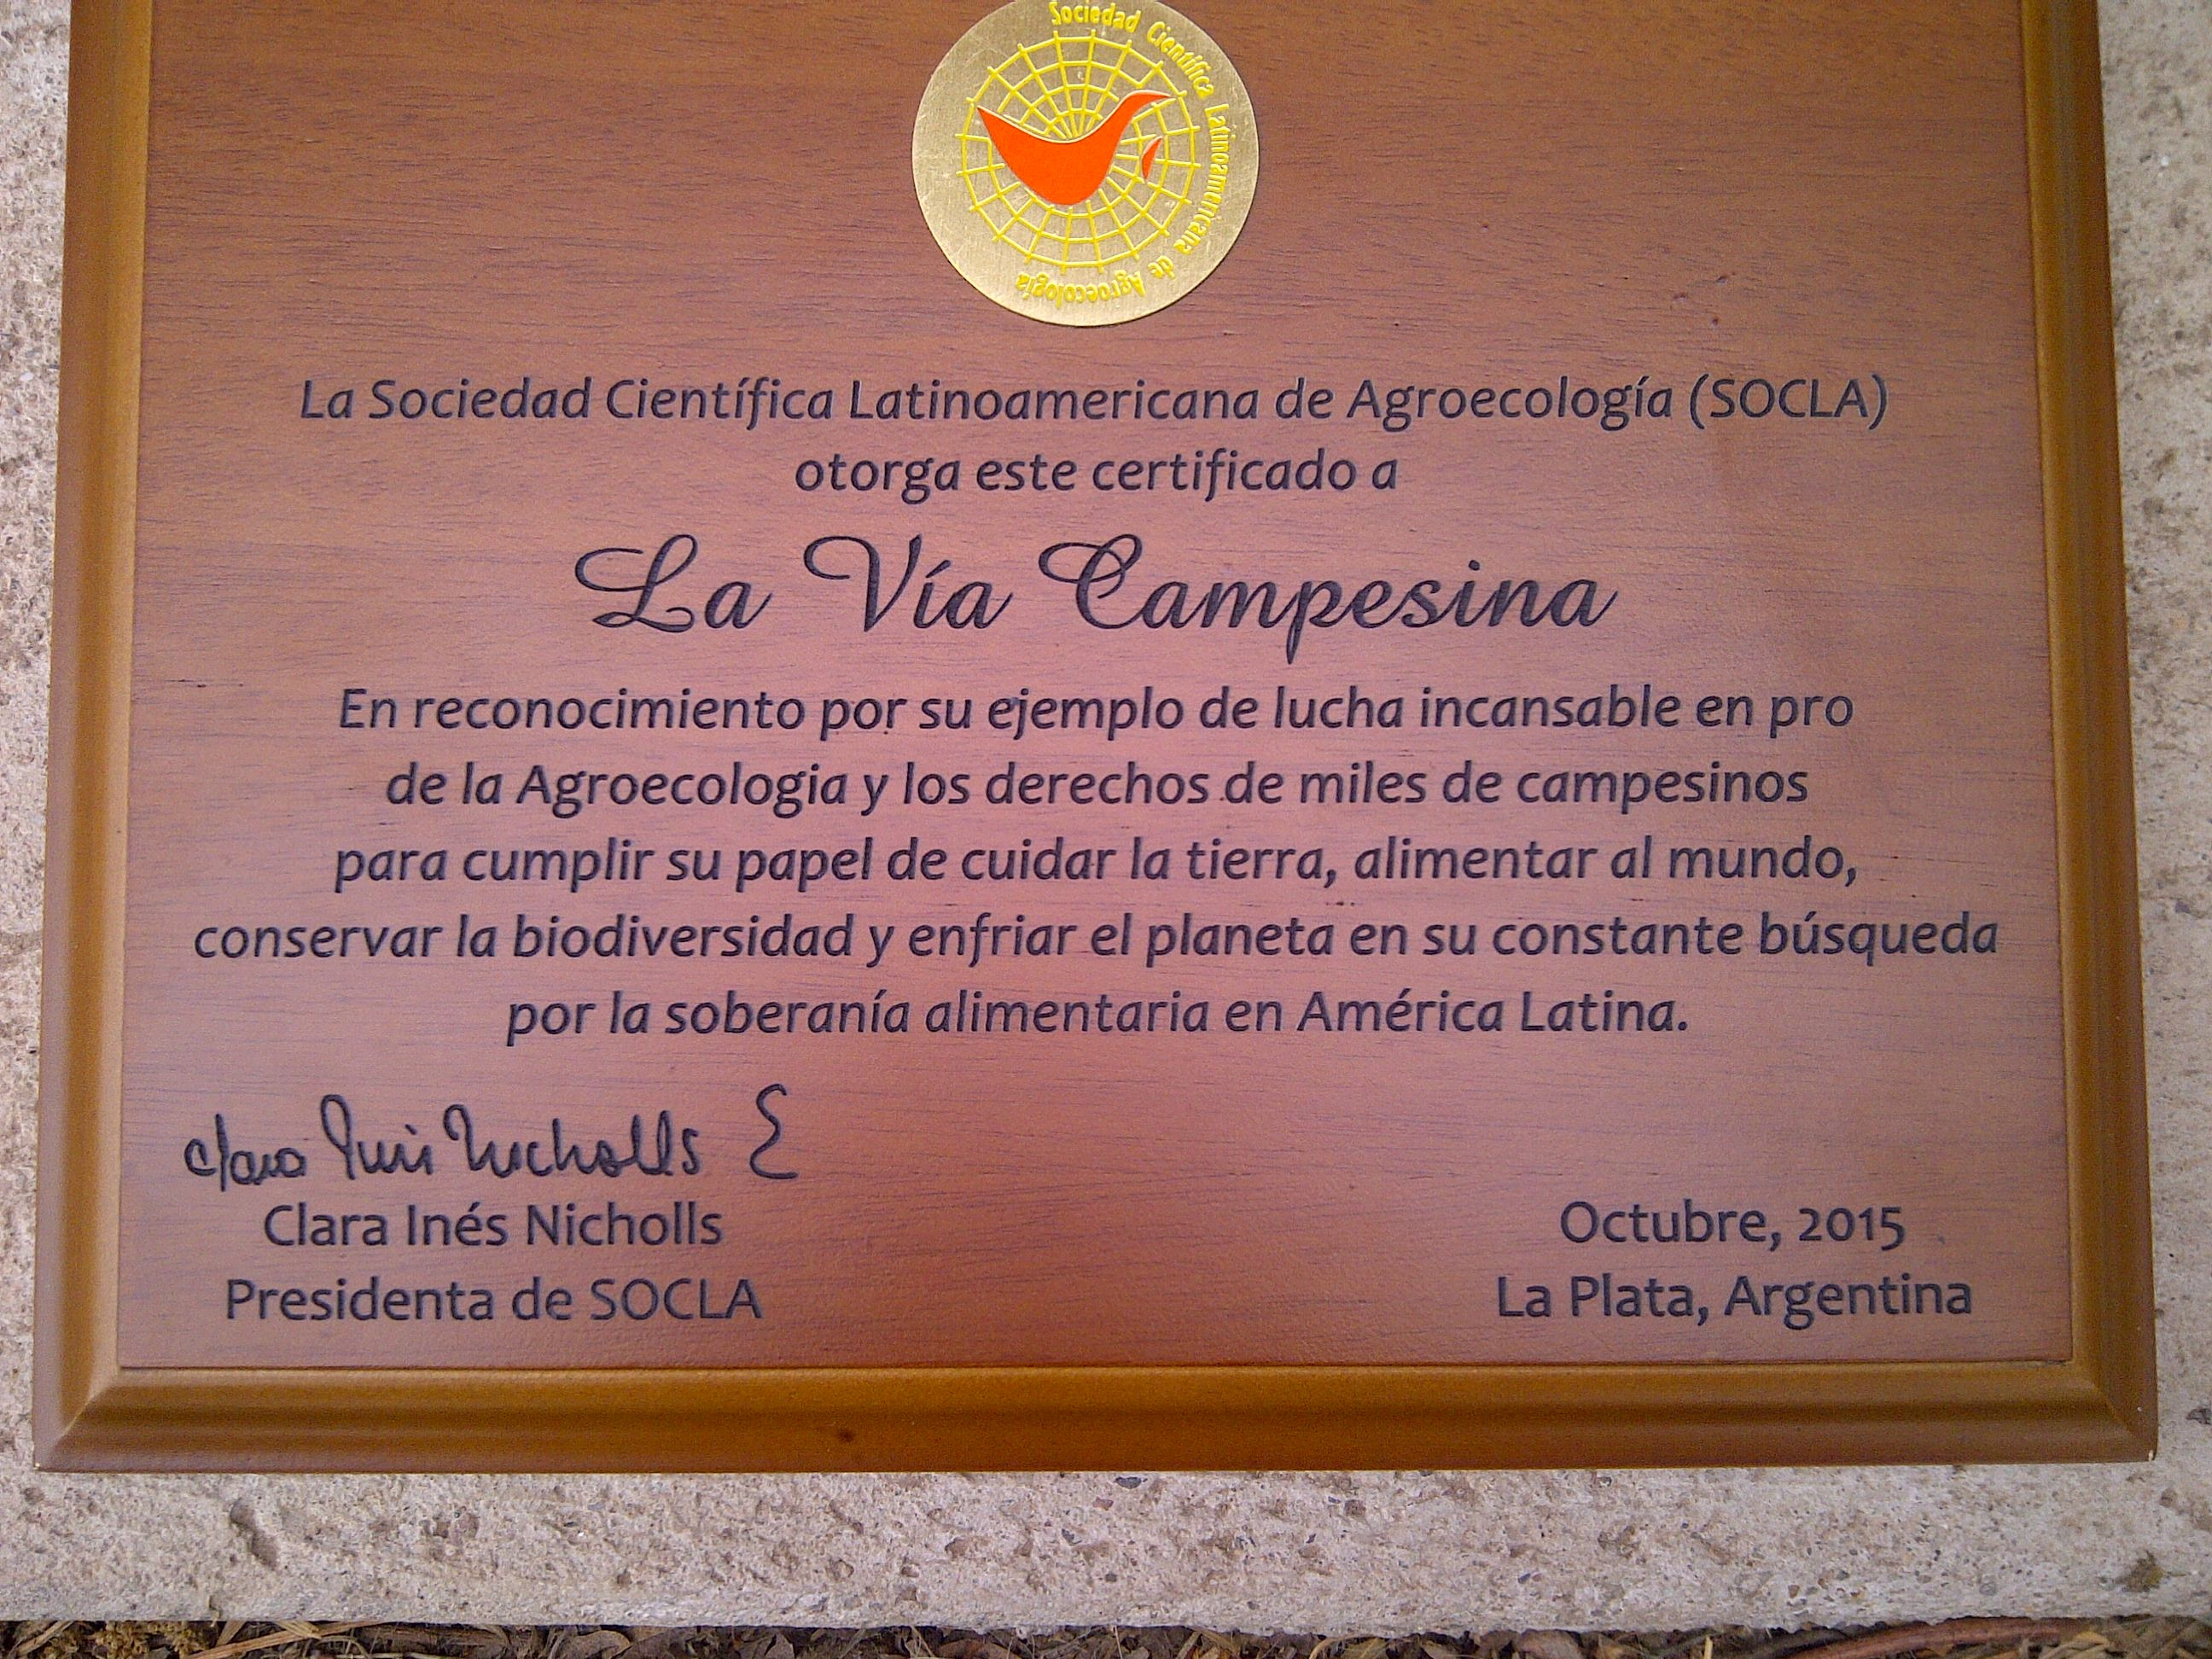 The award given by SOCLA to La Via Campesina